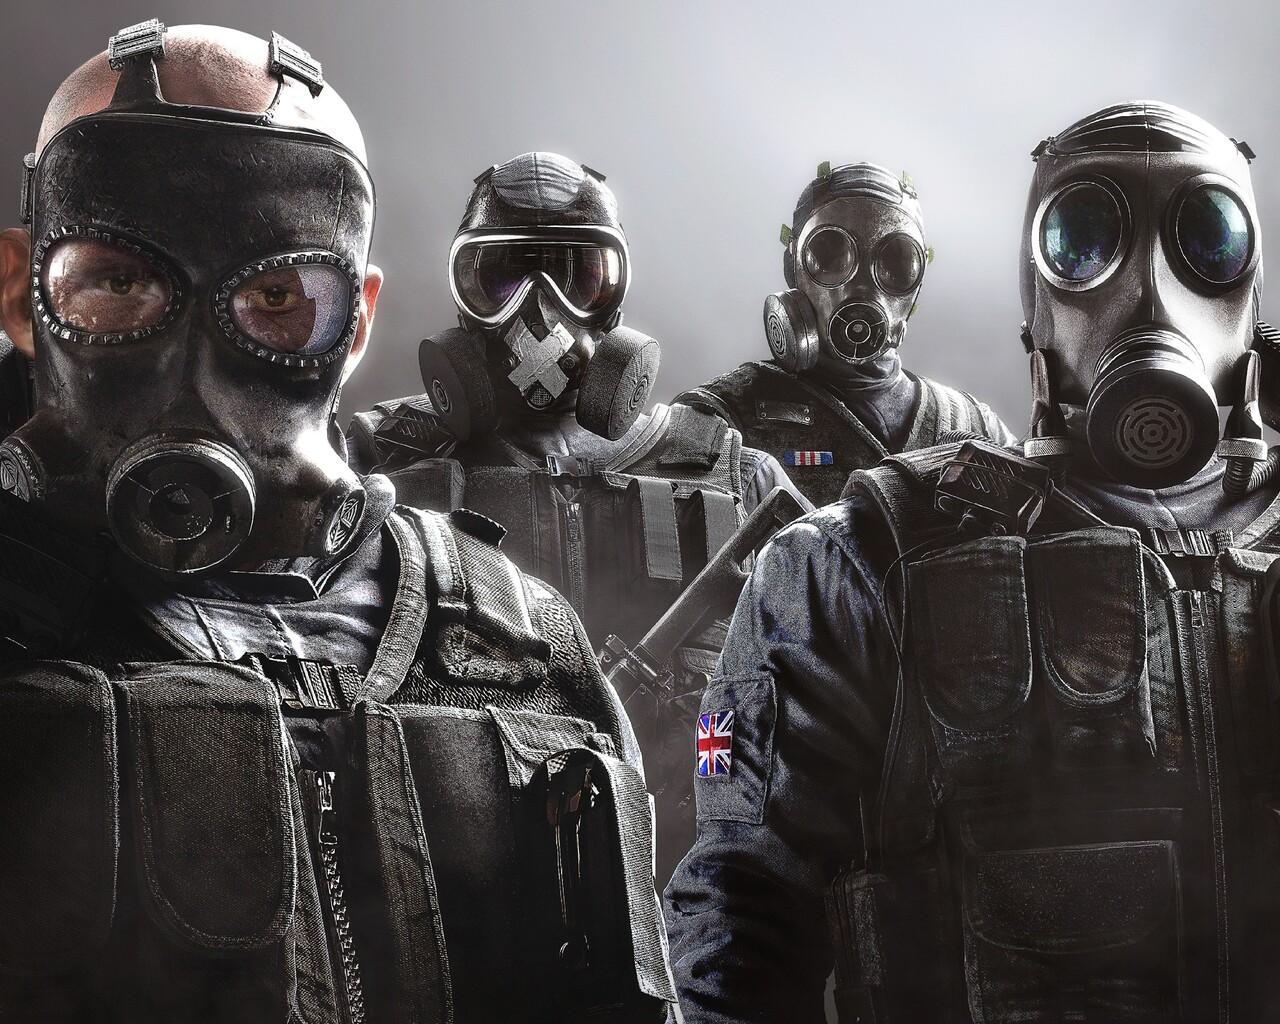 Soldier Video Games Rainbowsix Siege Digital Art Dark: 1280x1024 Tom Clancys Rainbow Six Siege 1280x1024